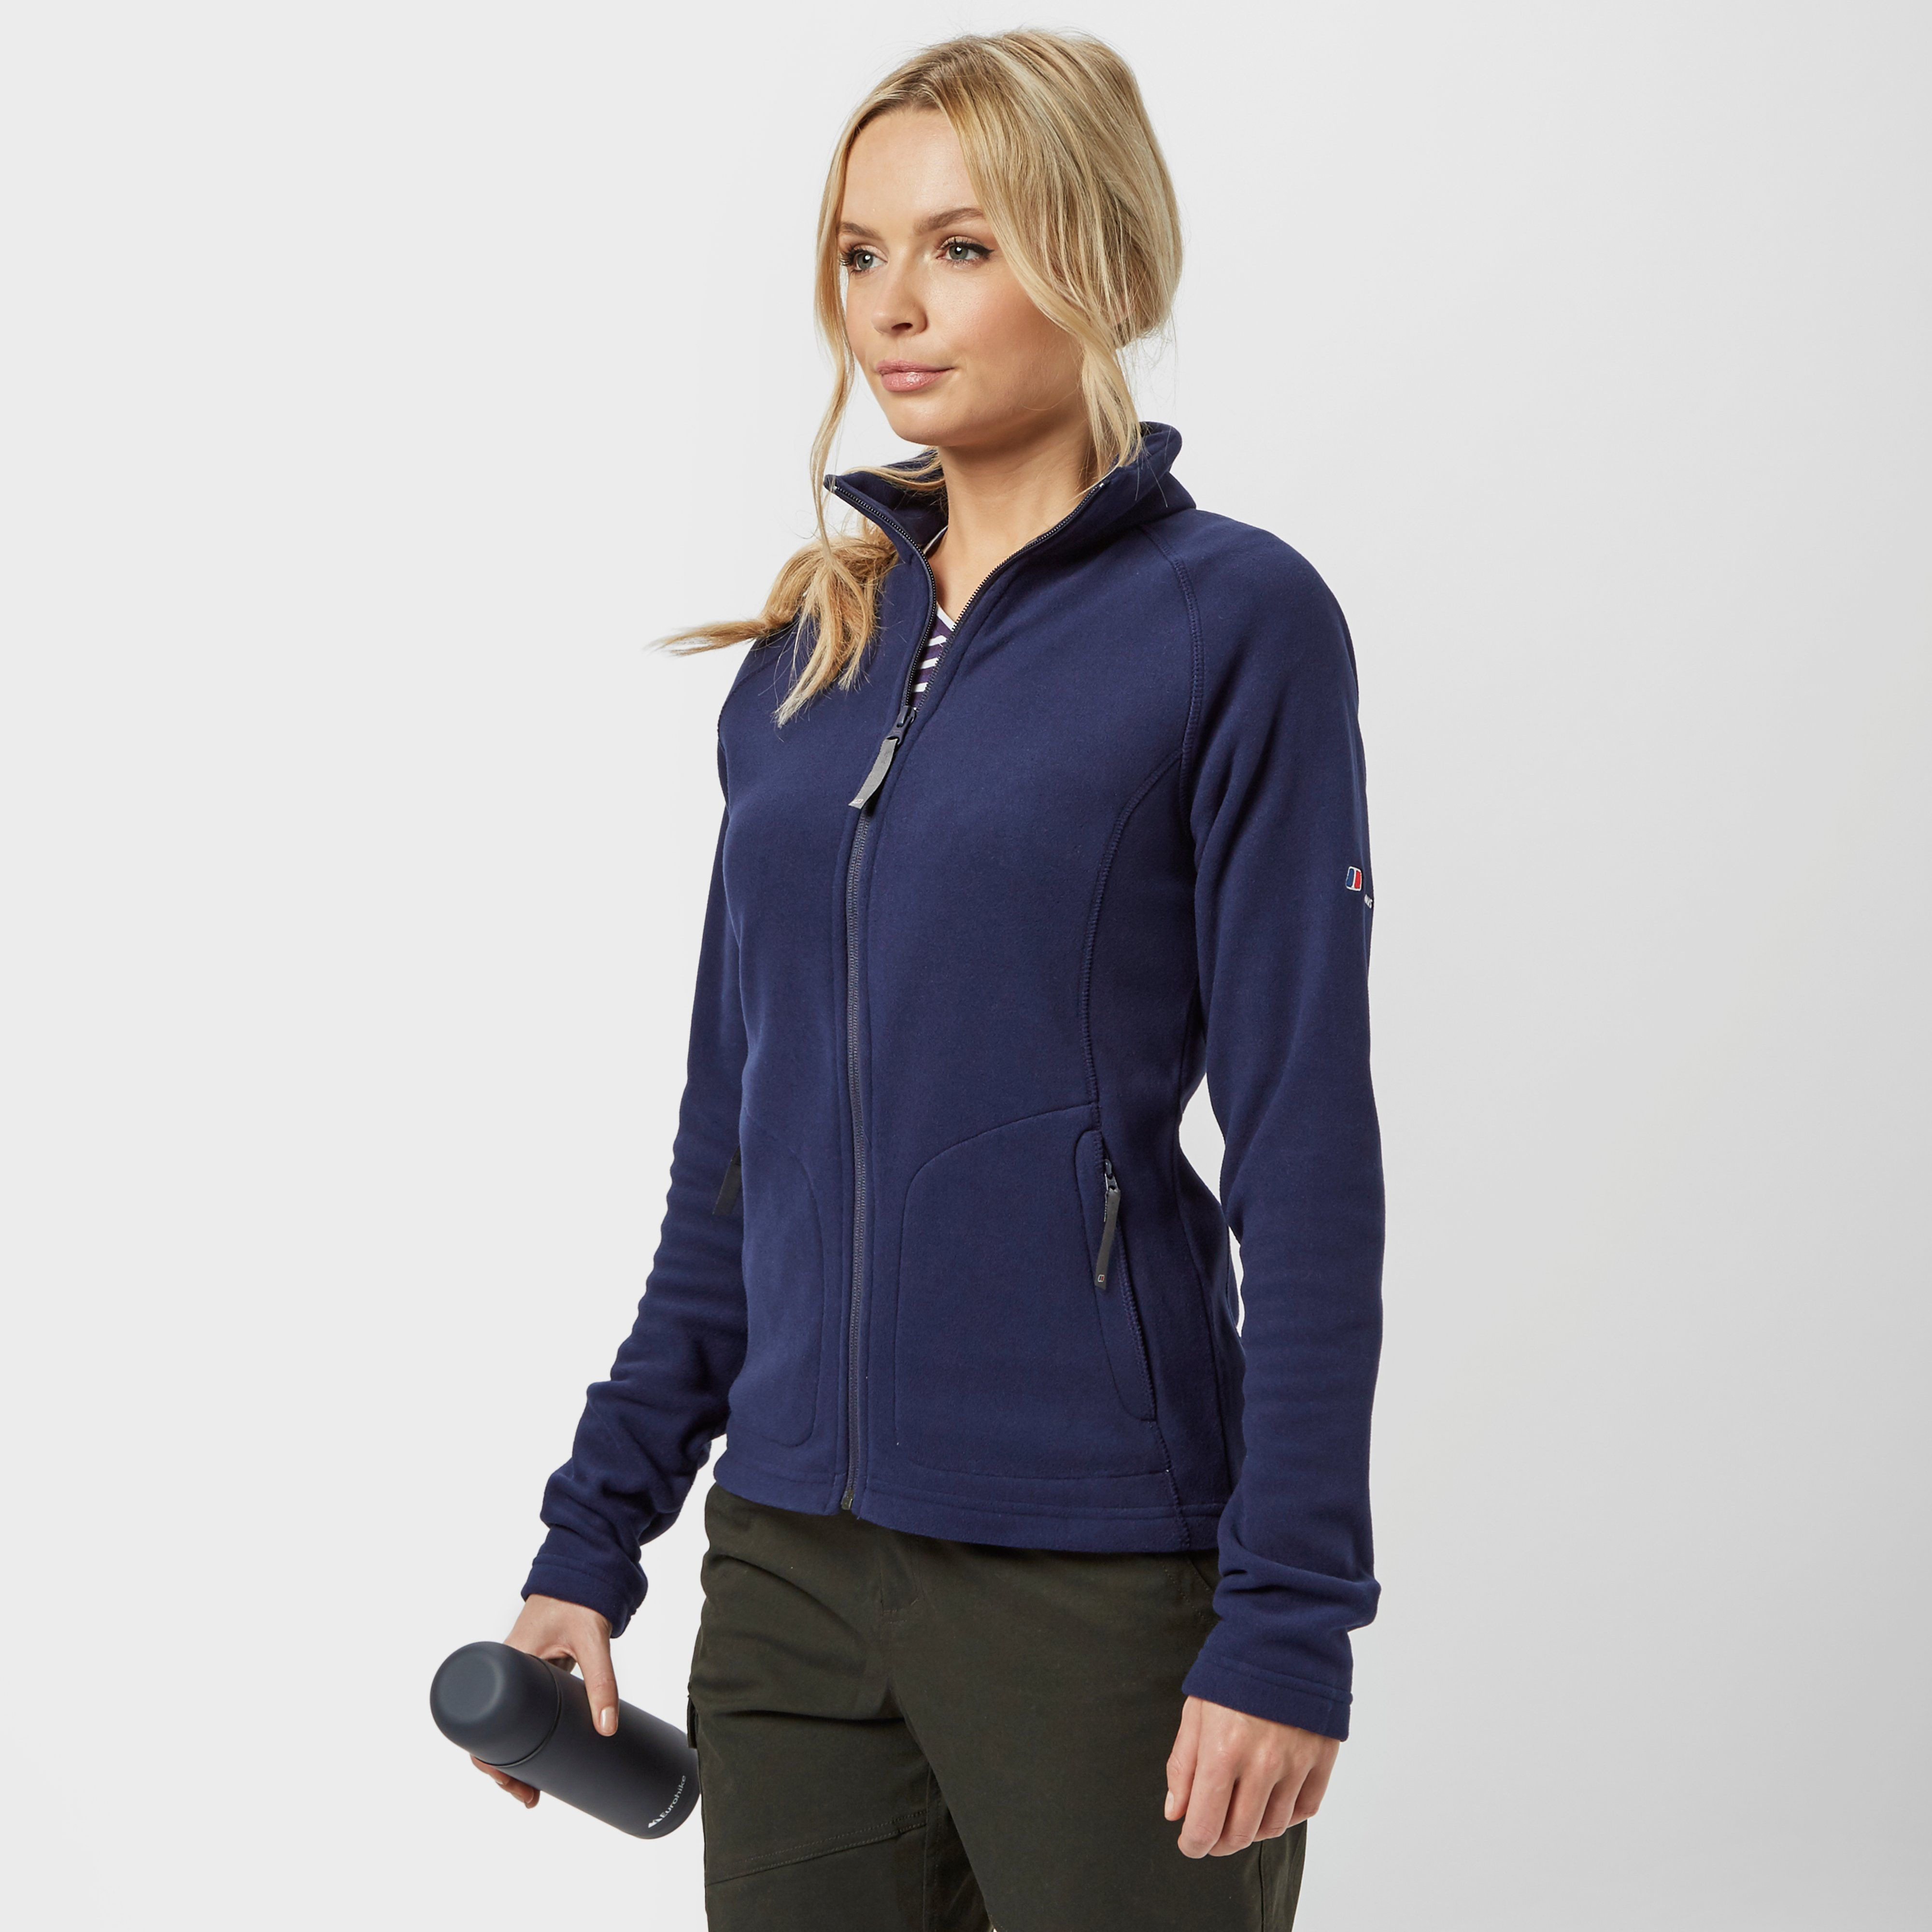 BERGHAUS Women's Arnside Full-Zip Fleece Jacket